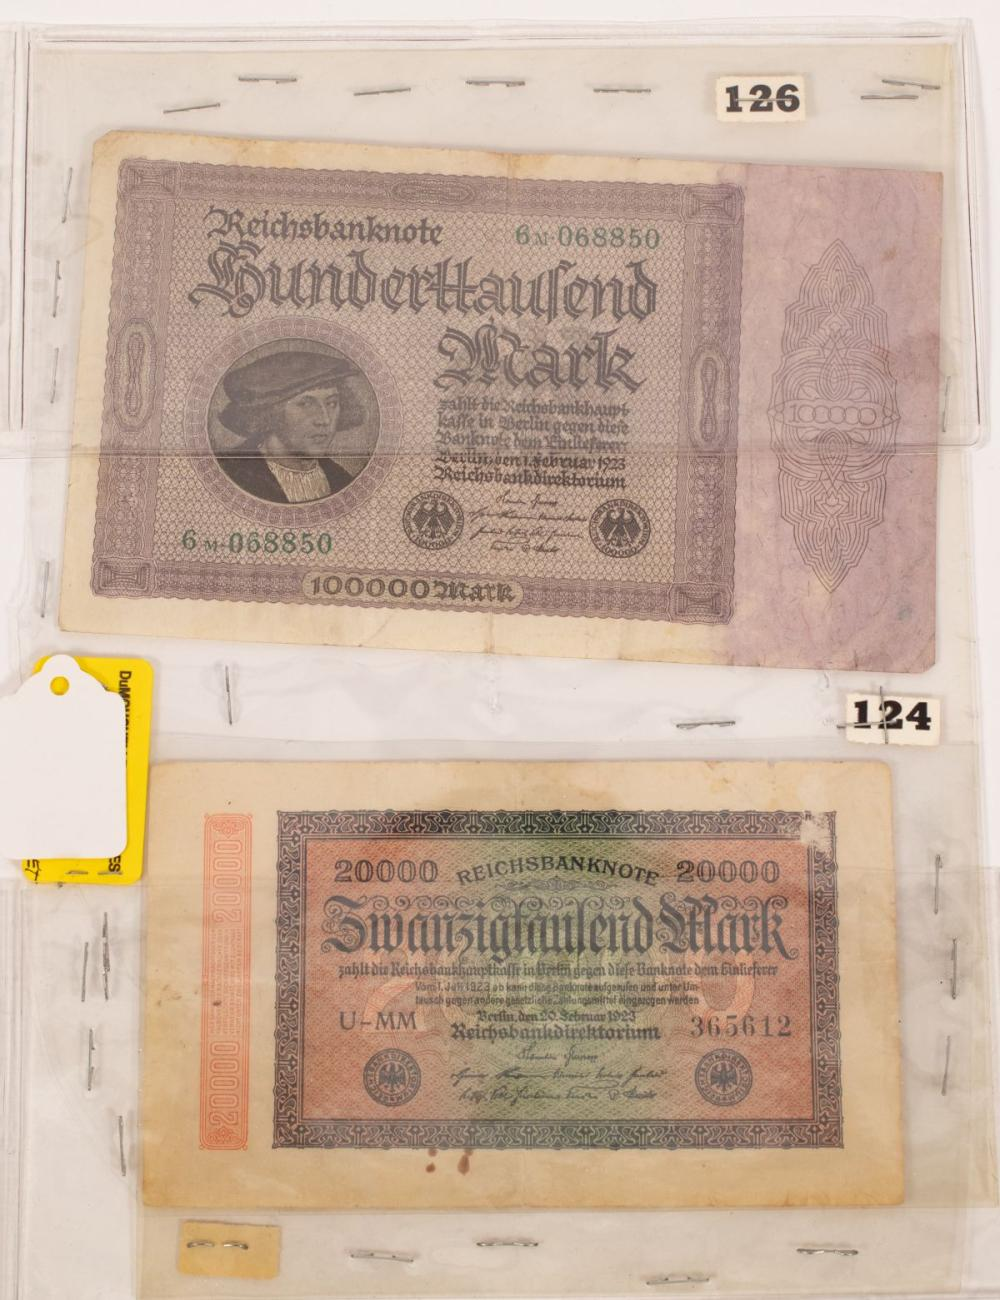 "GERMAN PAPER CURRENCY NOTES 20,000. MARK, #3365612 BERLIN 1923 & 100,000. MARK #6M068850 BERLIN 1923 (2) H 10"" W 8"" IMAGE"